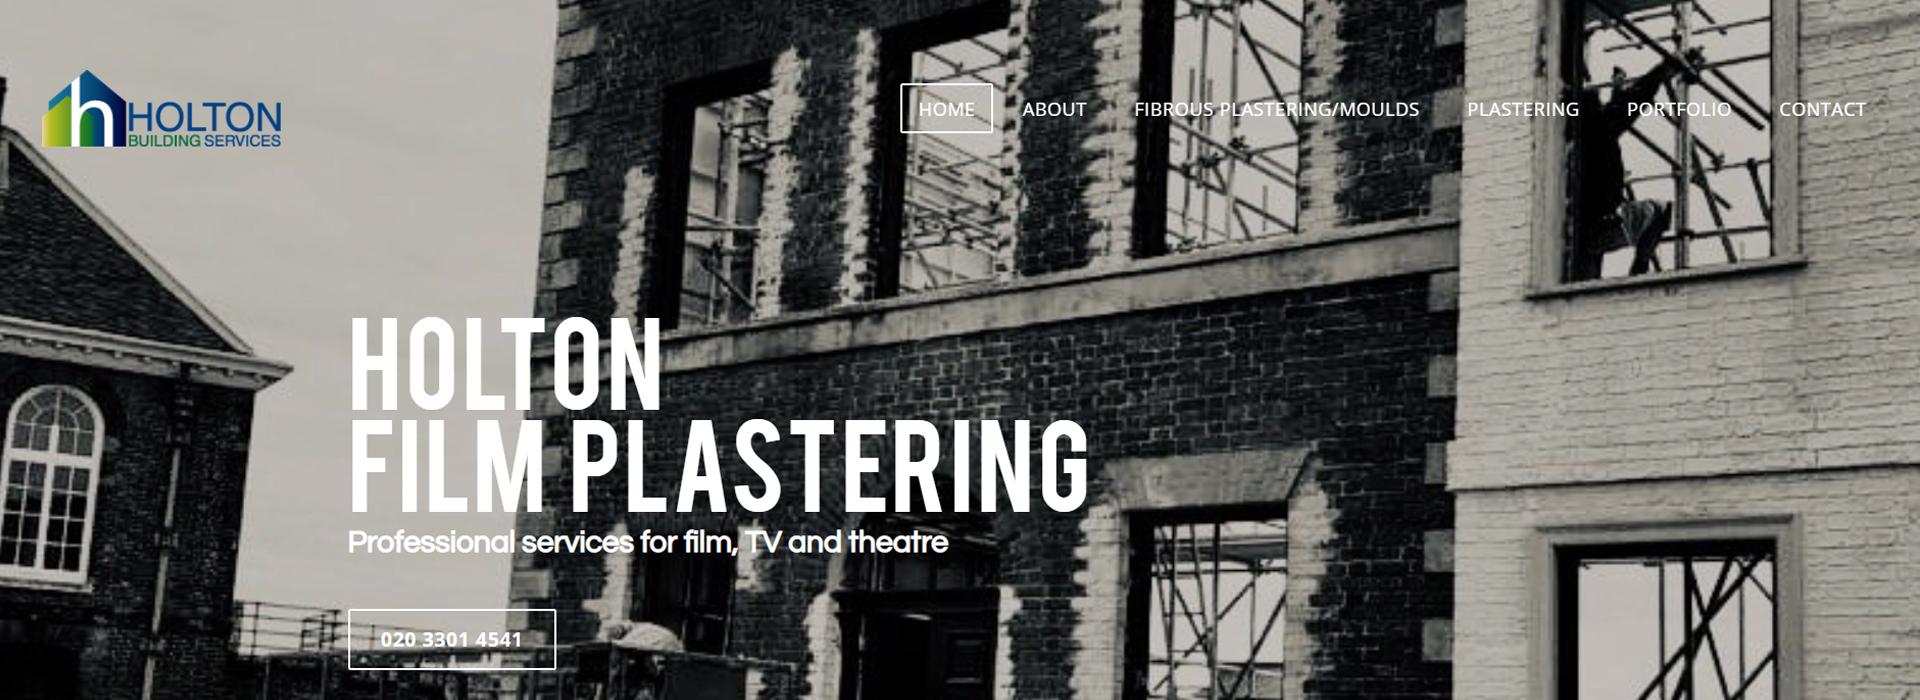 Holton film plastering